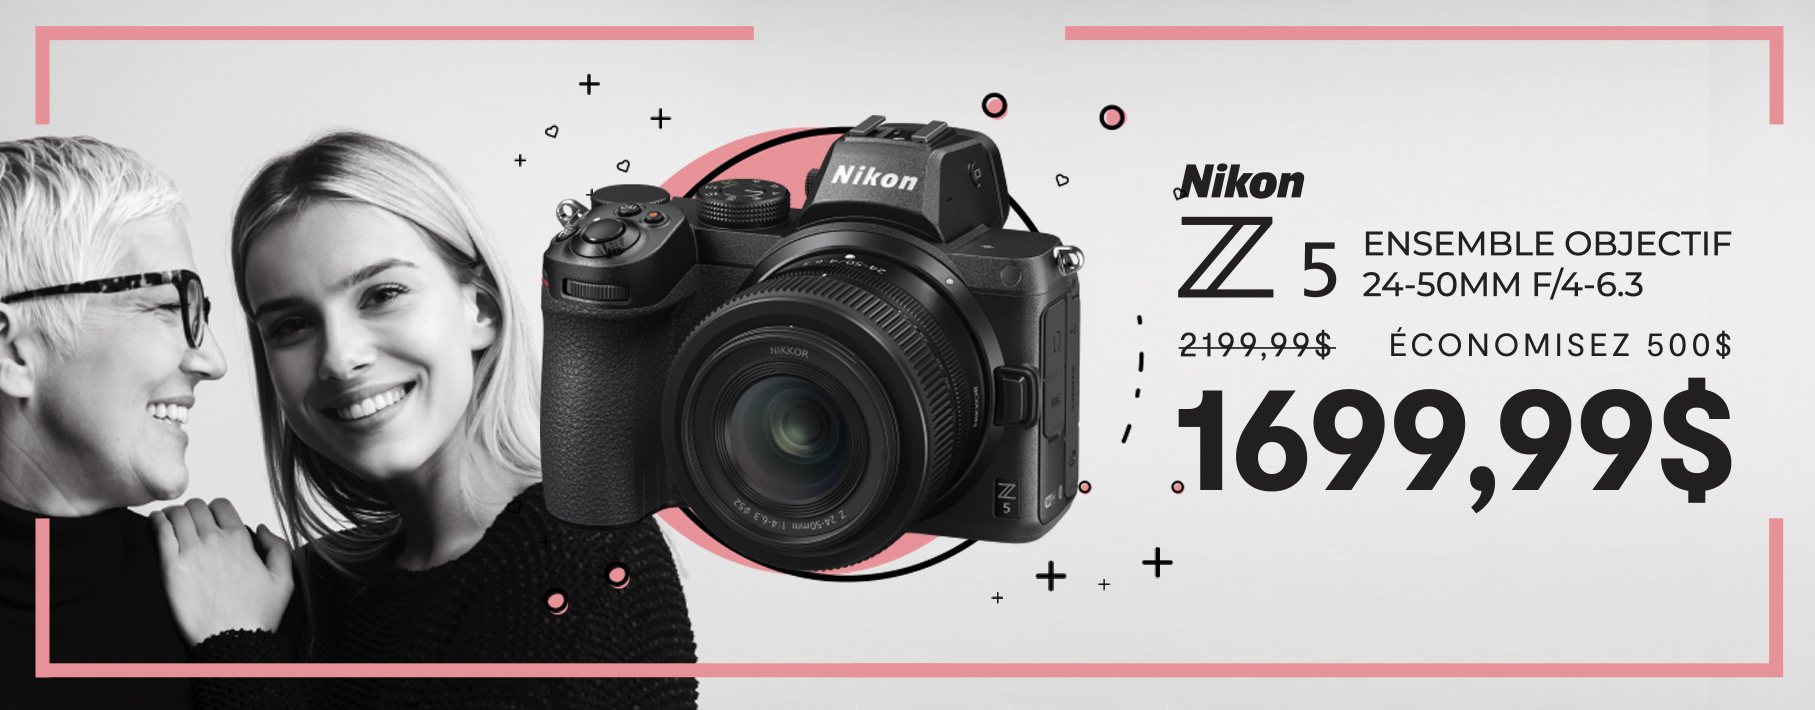 Nikon Z5 Mother Day